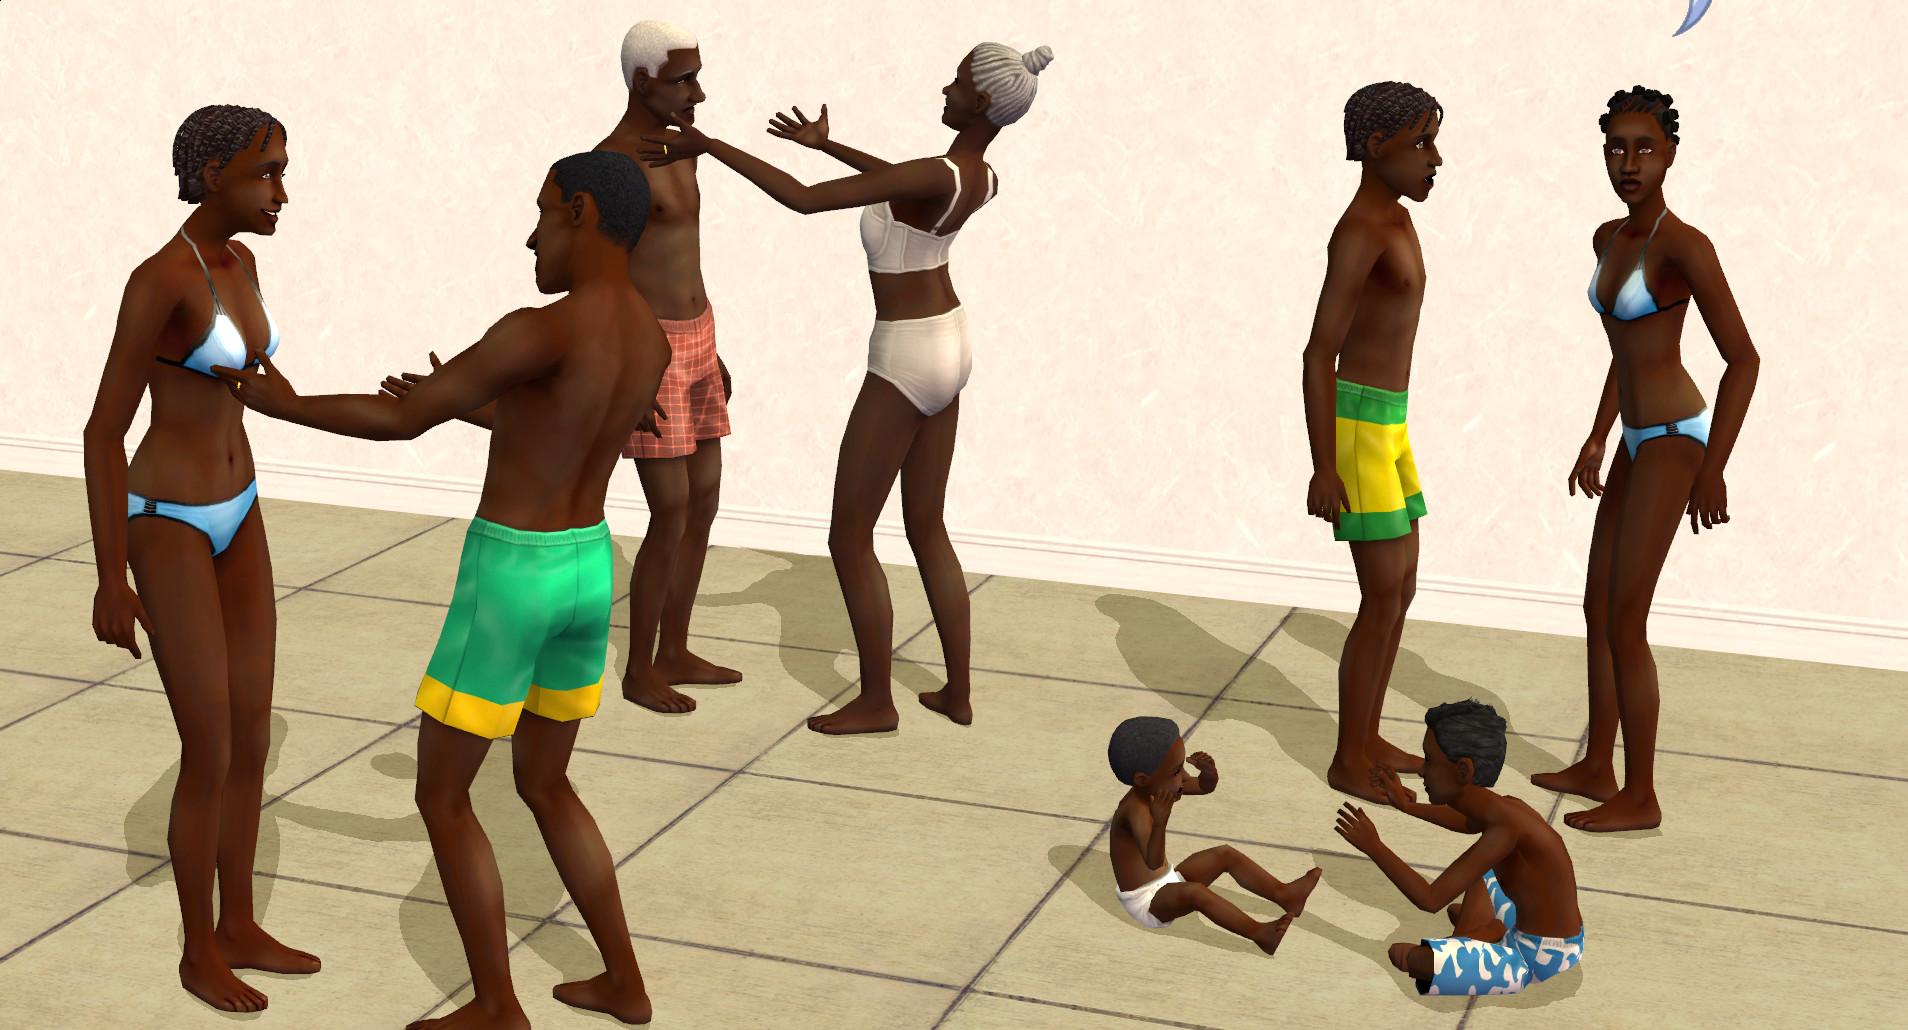 The sims castaway nude patch nackt photos